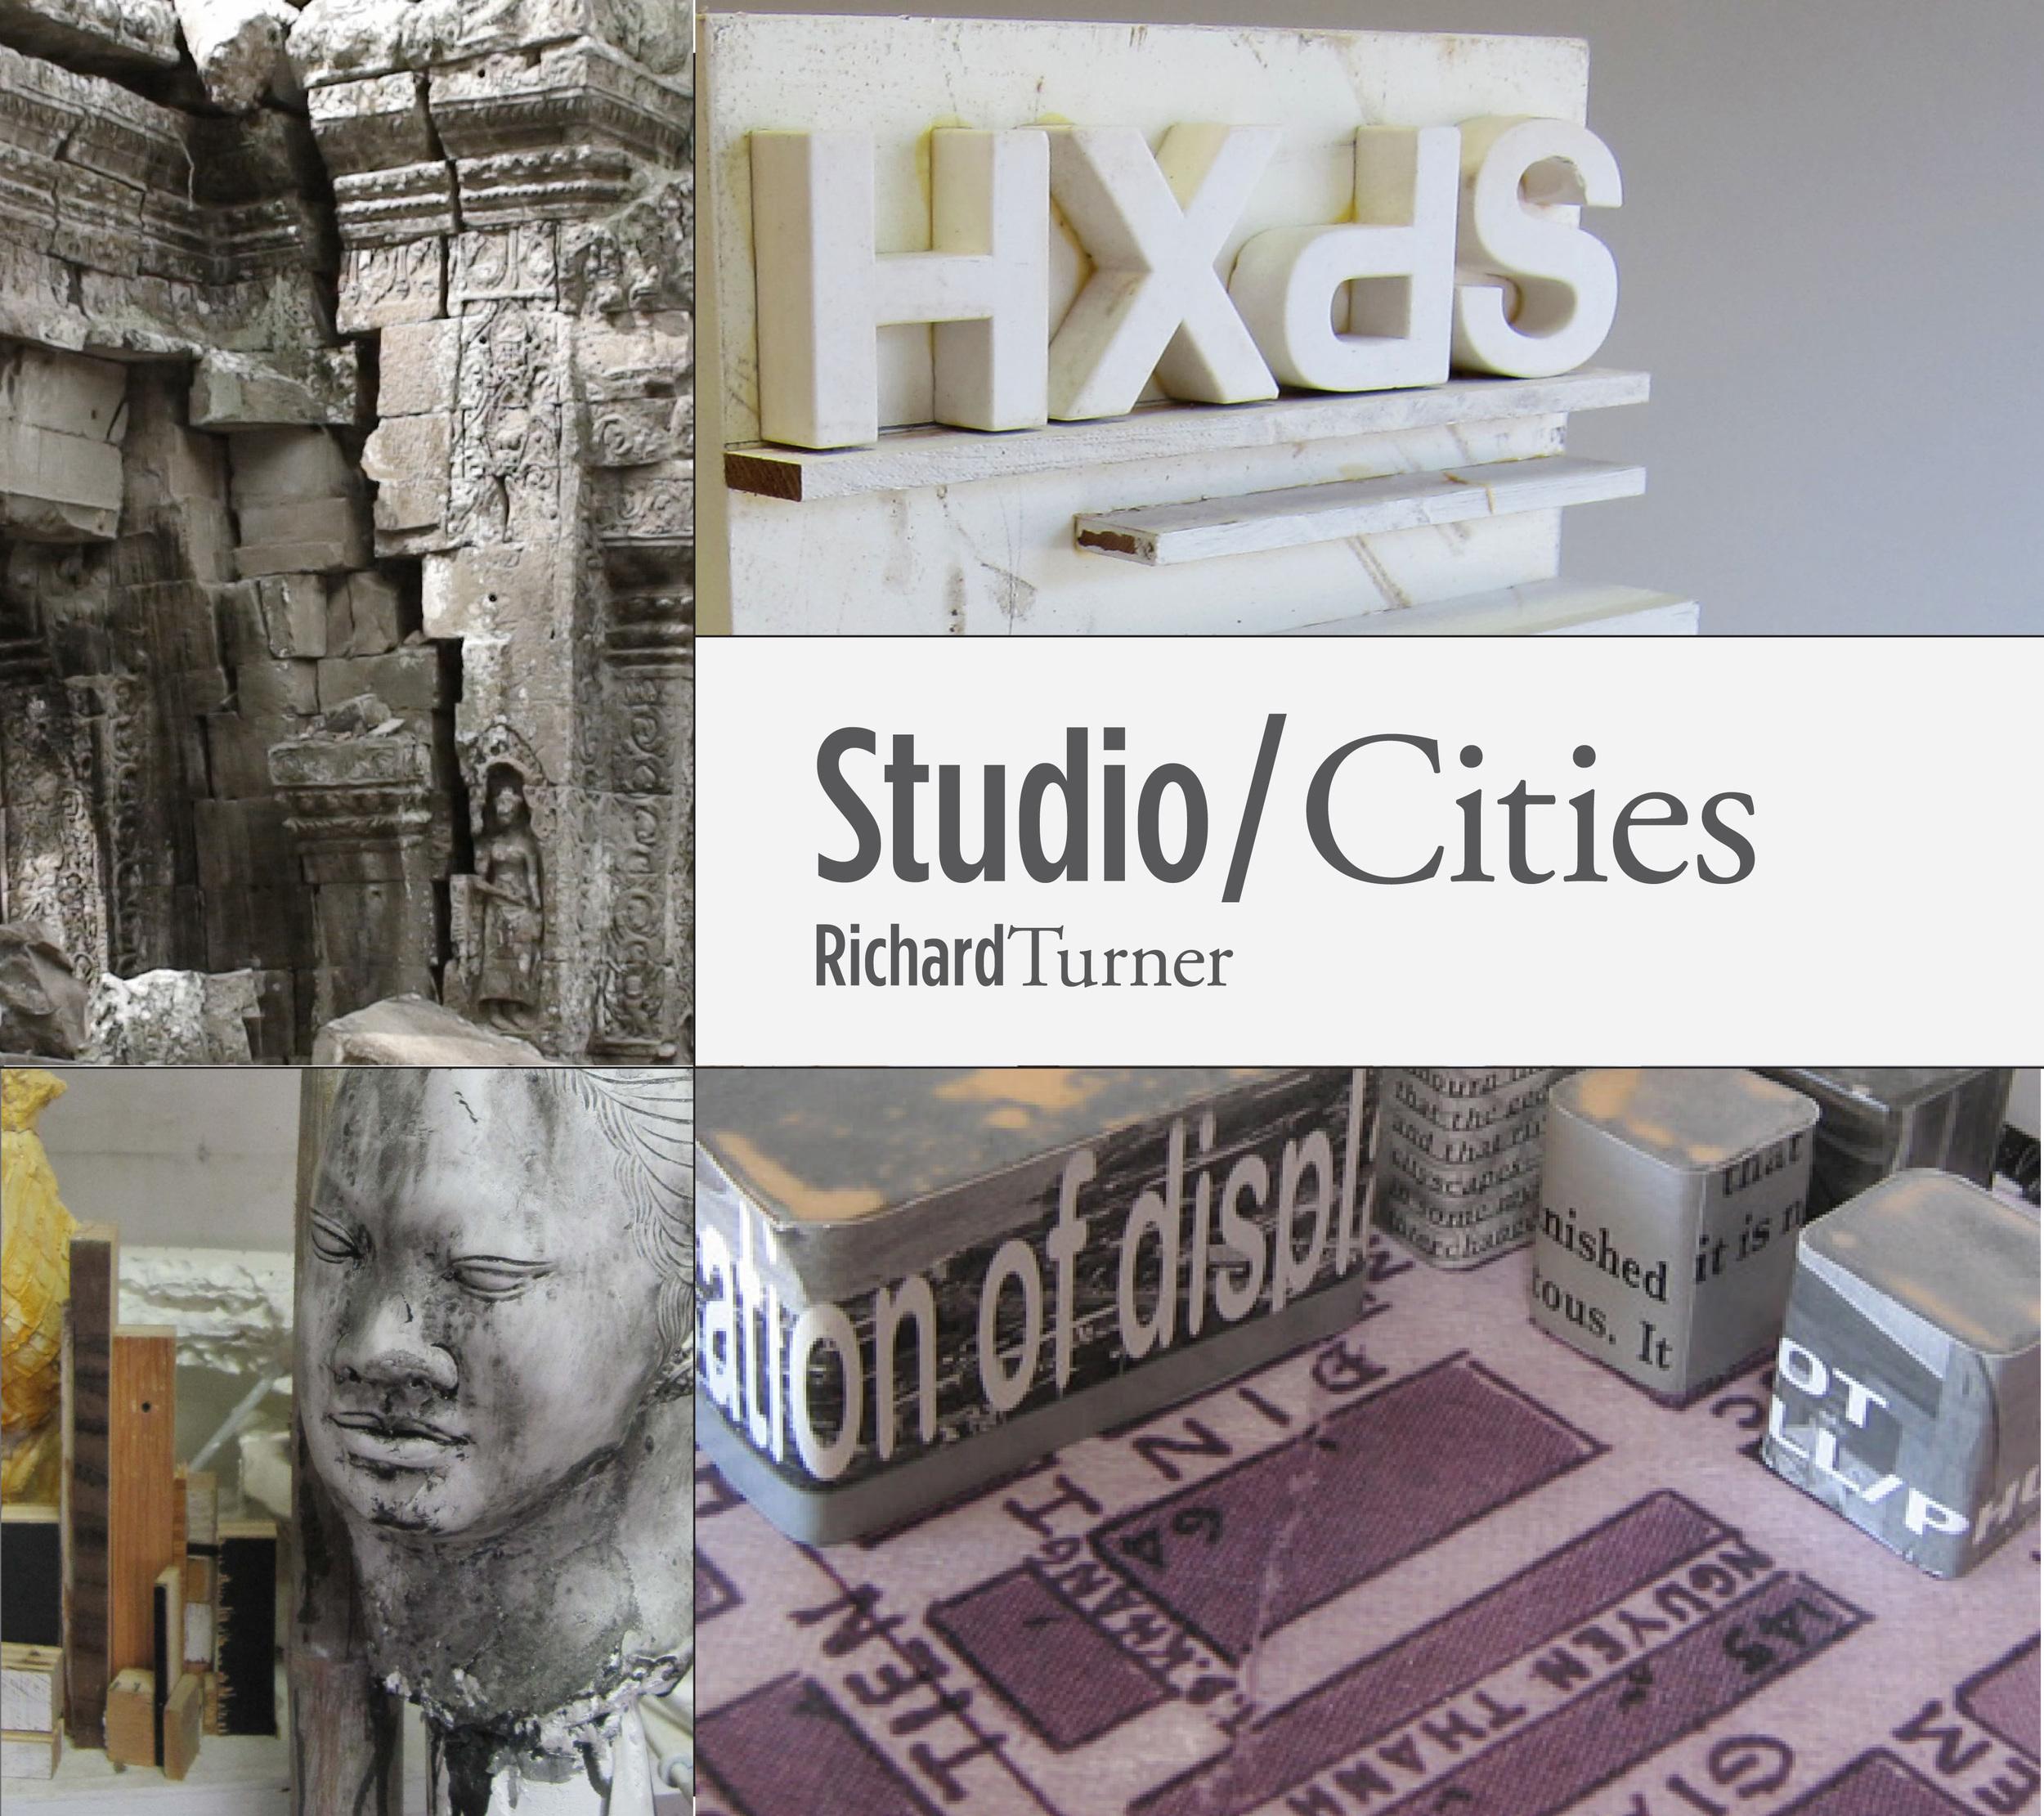 studio_cities_coverblurb.jpg